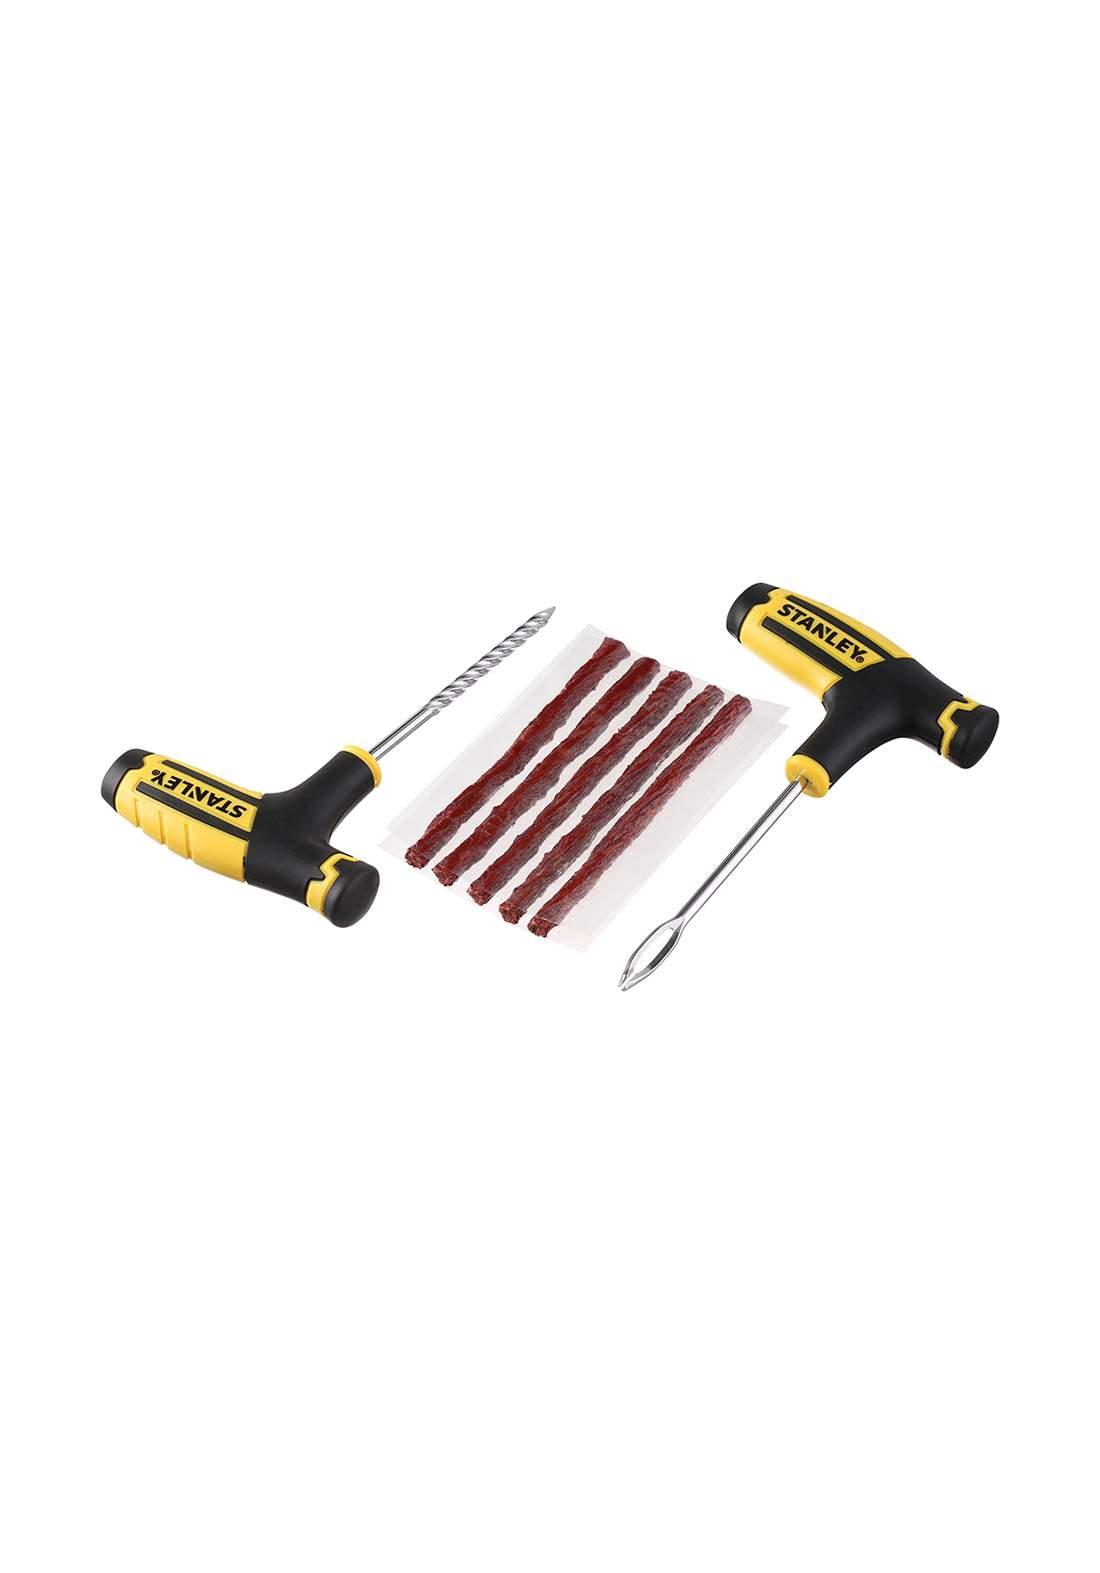 Stanley STHT80891-0 Automotive Tire Repair Kit مجموعة اصلاح اطارات السيارة